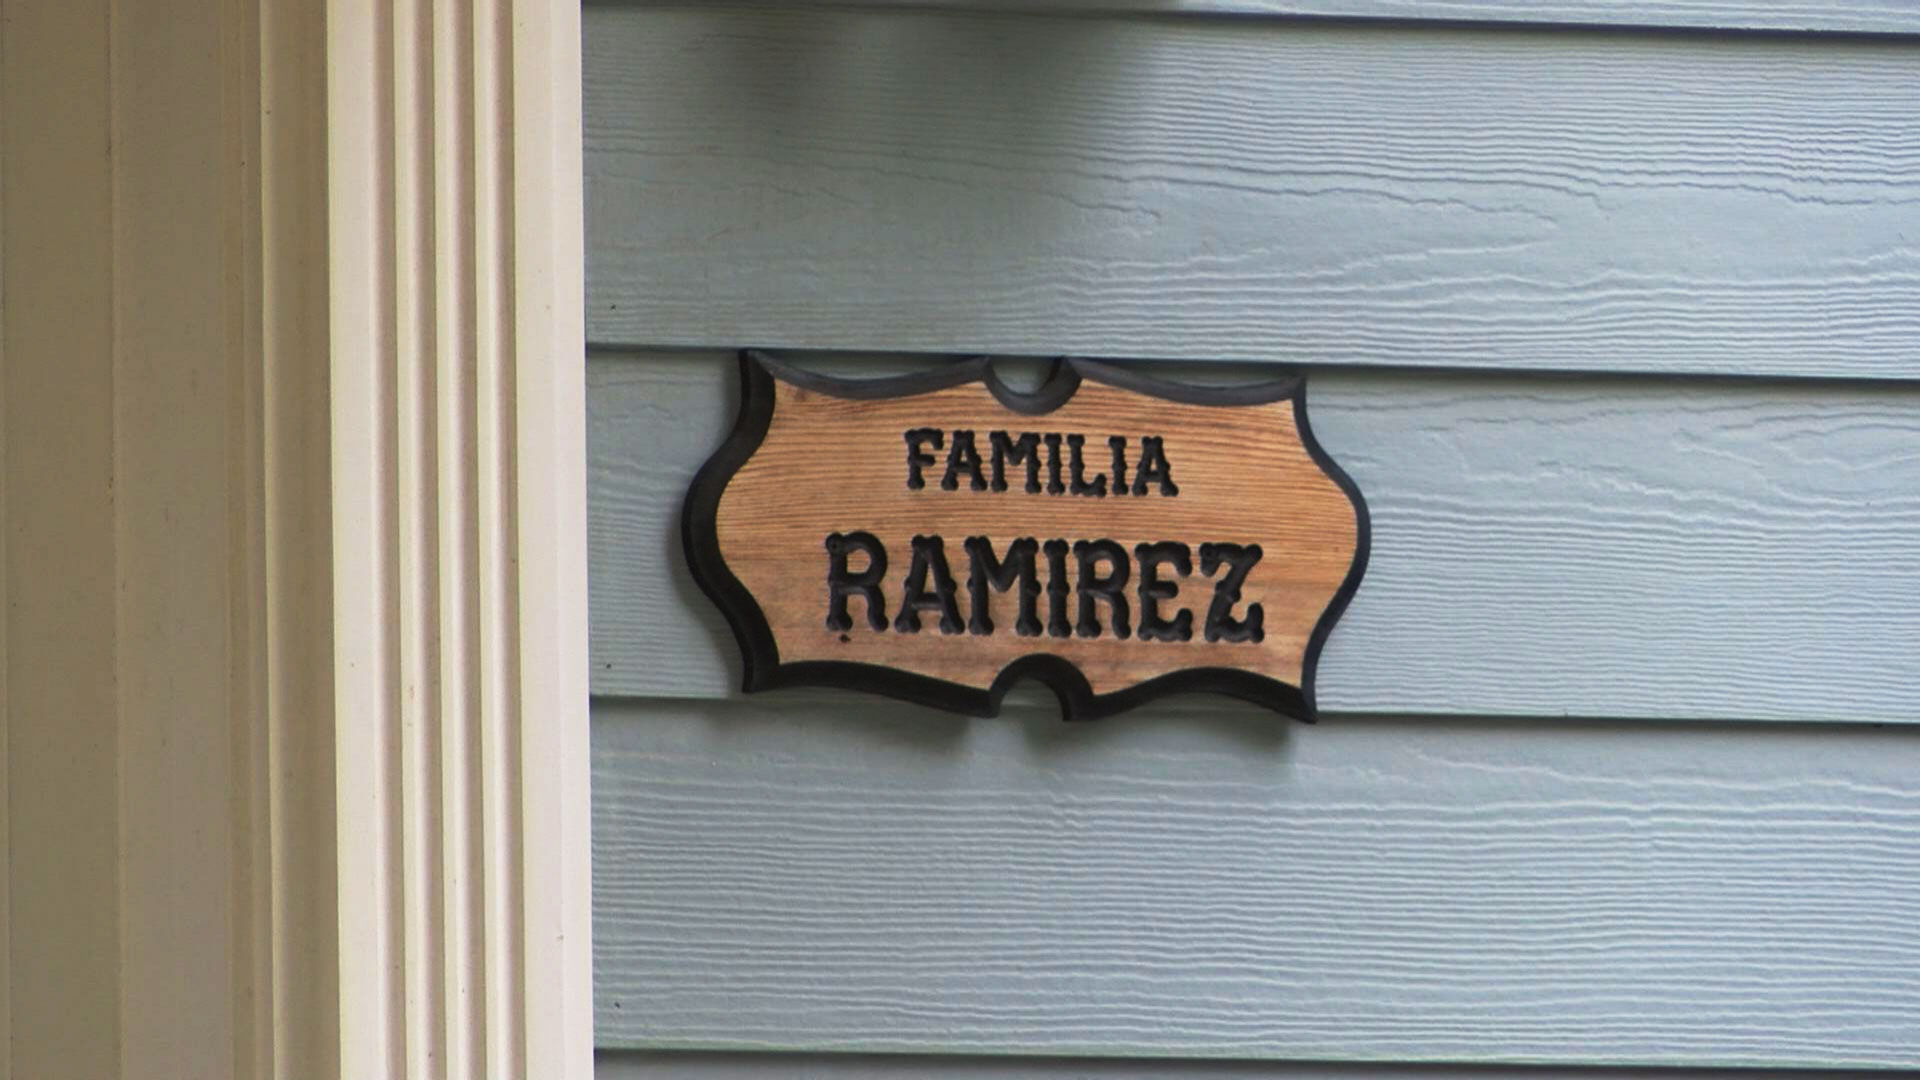 KELO Ramirez Family.jpg